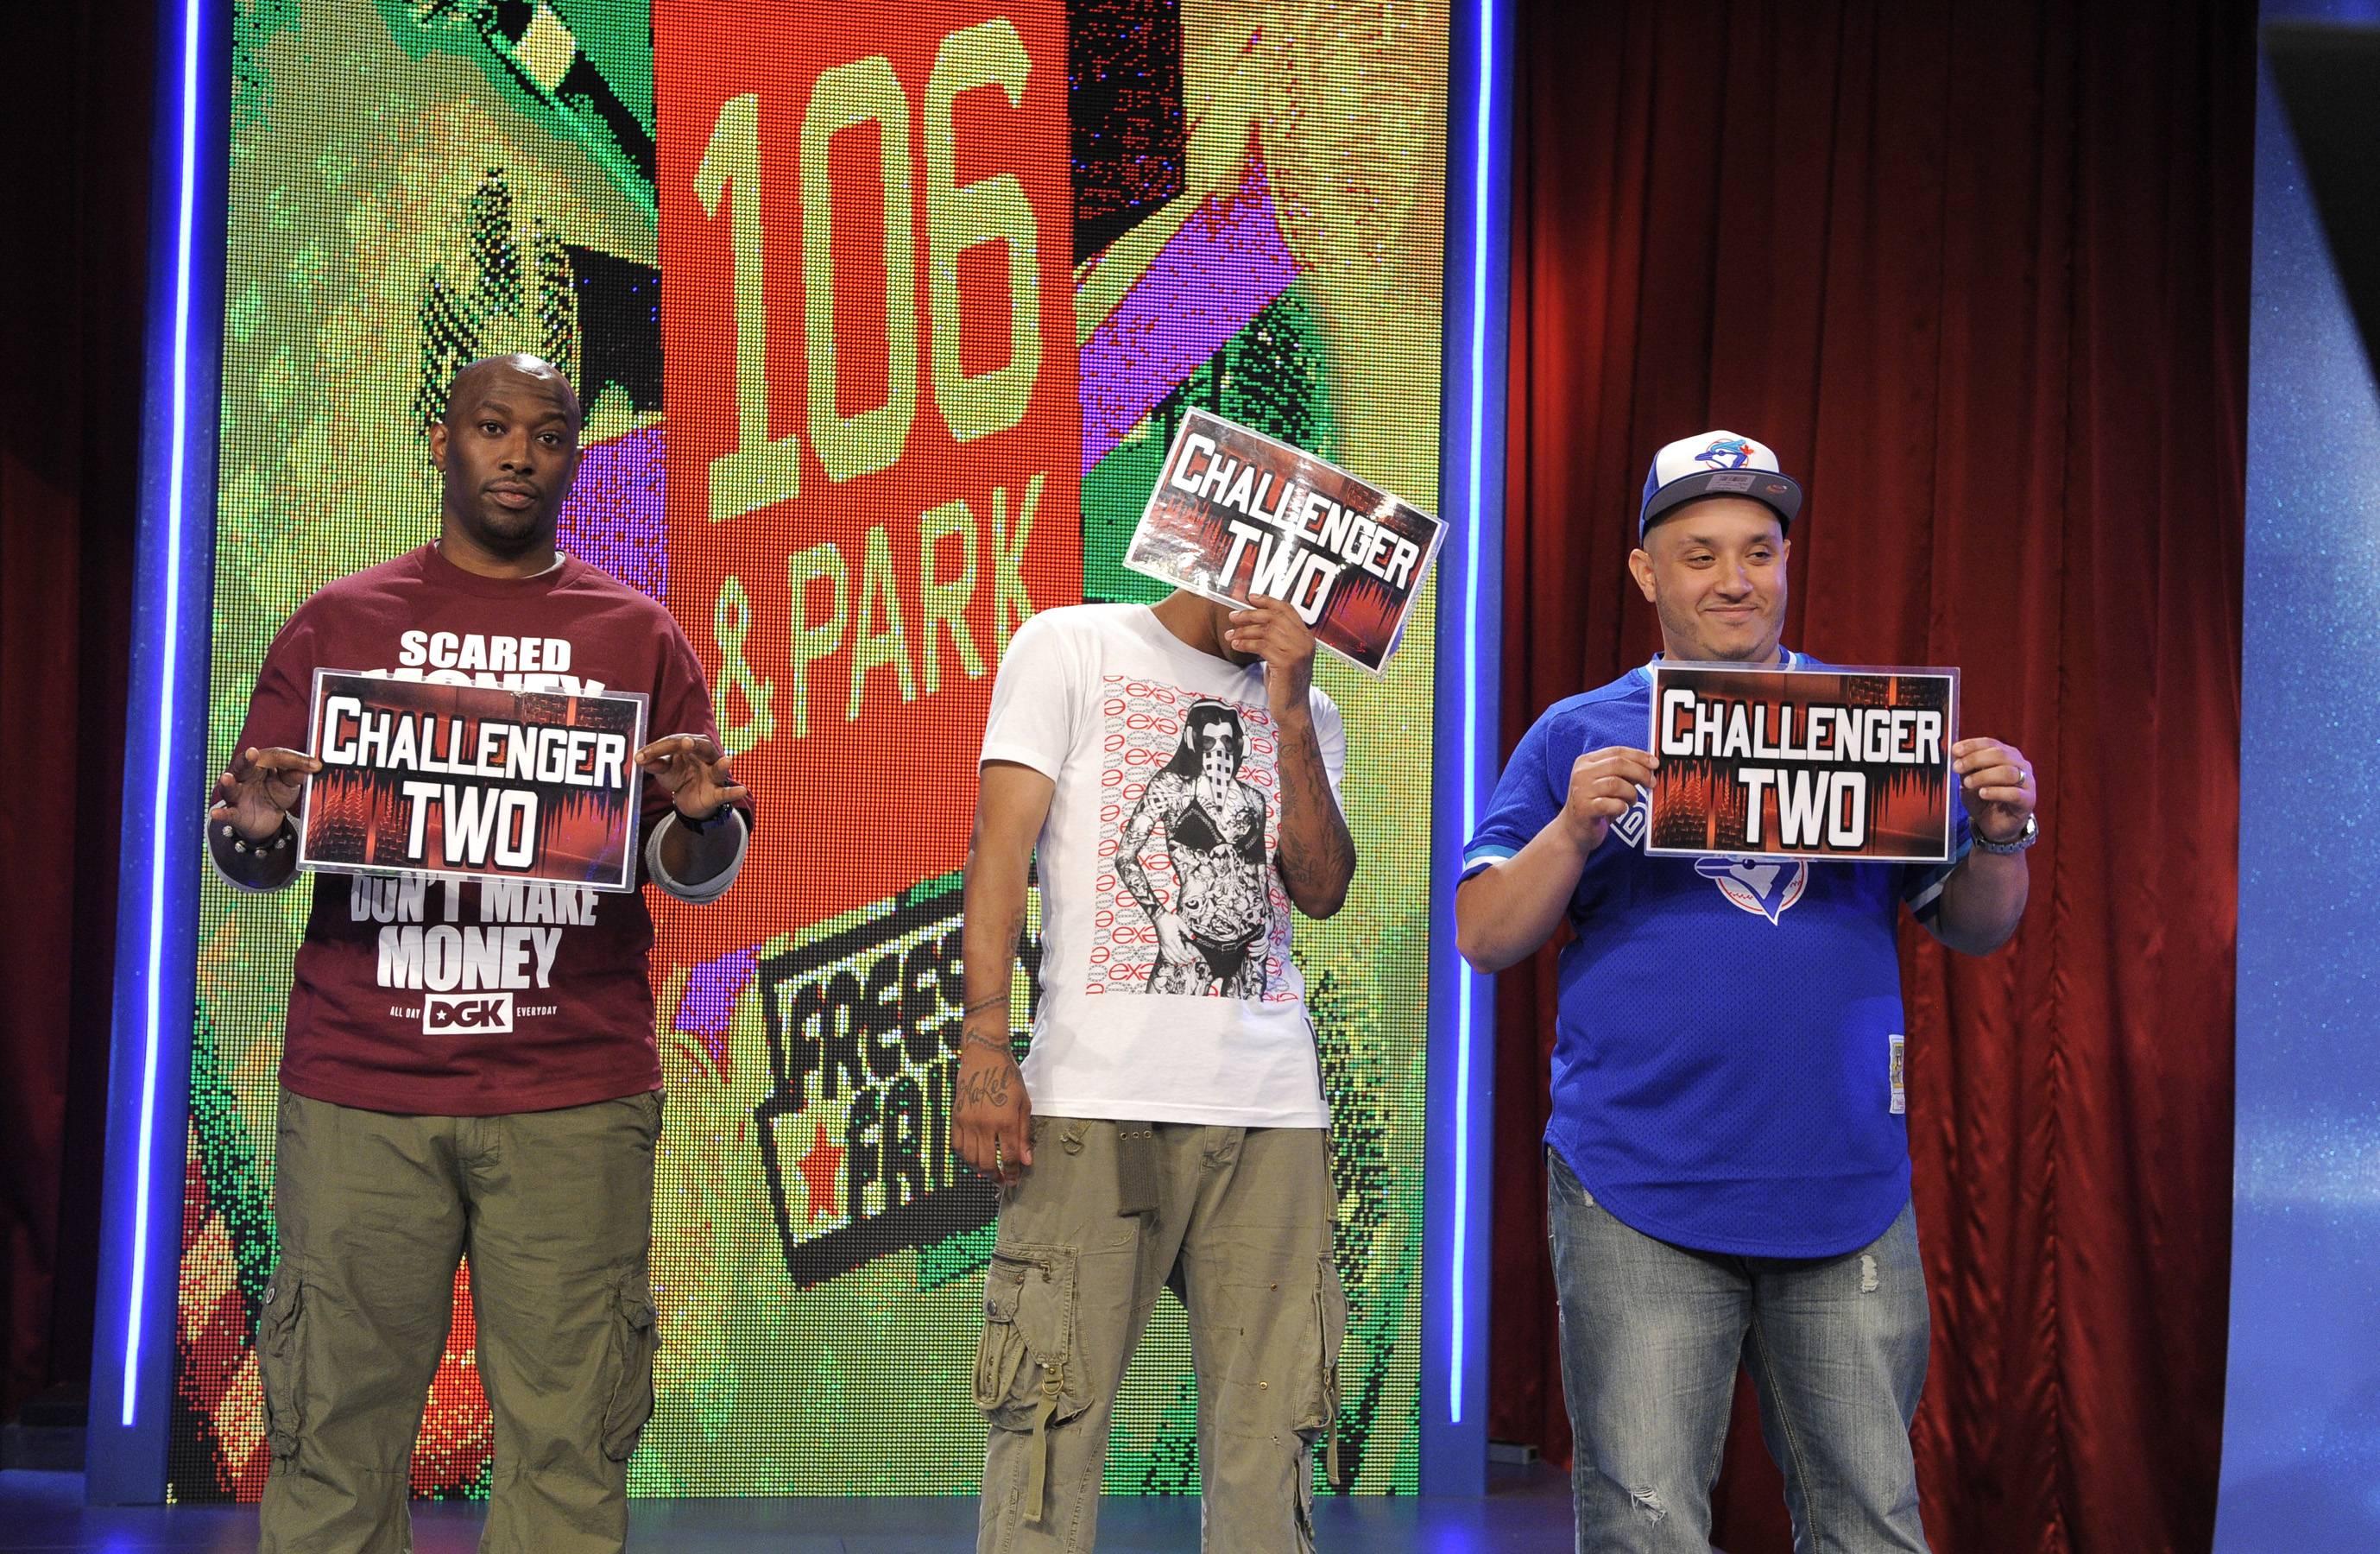 He Won - Freestyle Friday judges Bink! Bones Brigante and AJ Ahmed at 106 & Park, May 25, 2012. (Photo: John Ricard / BET)